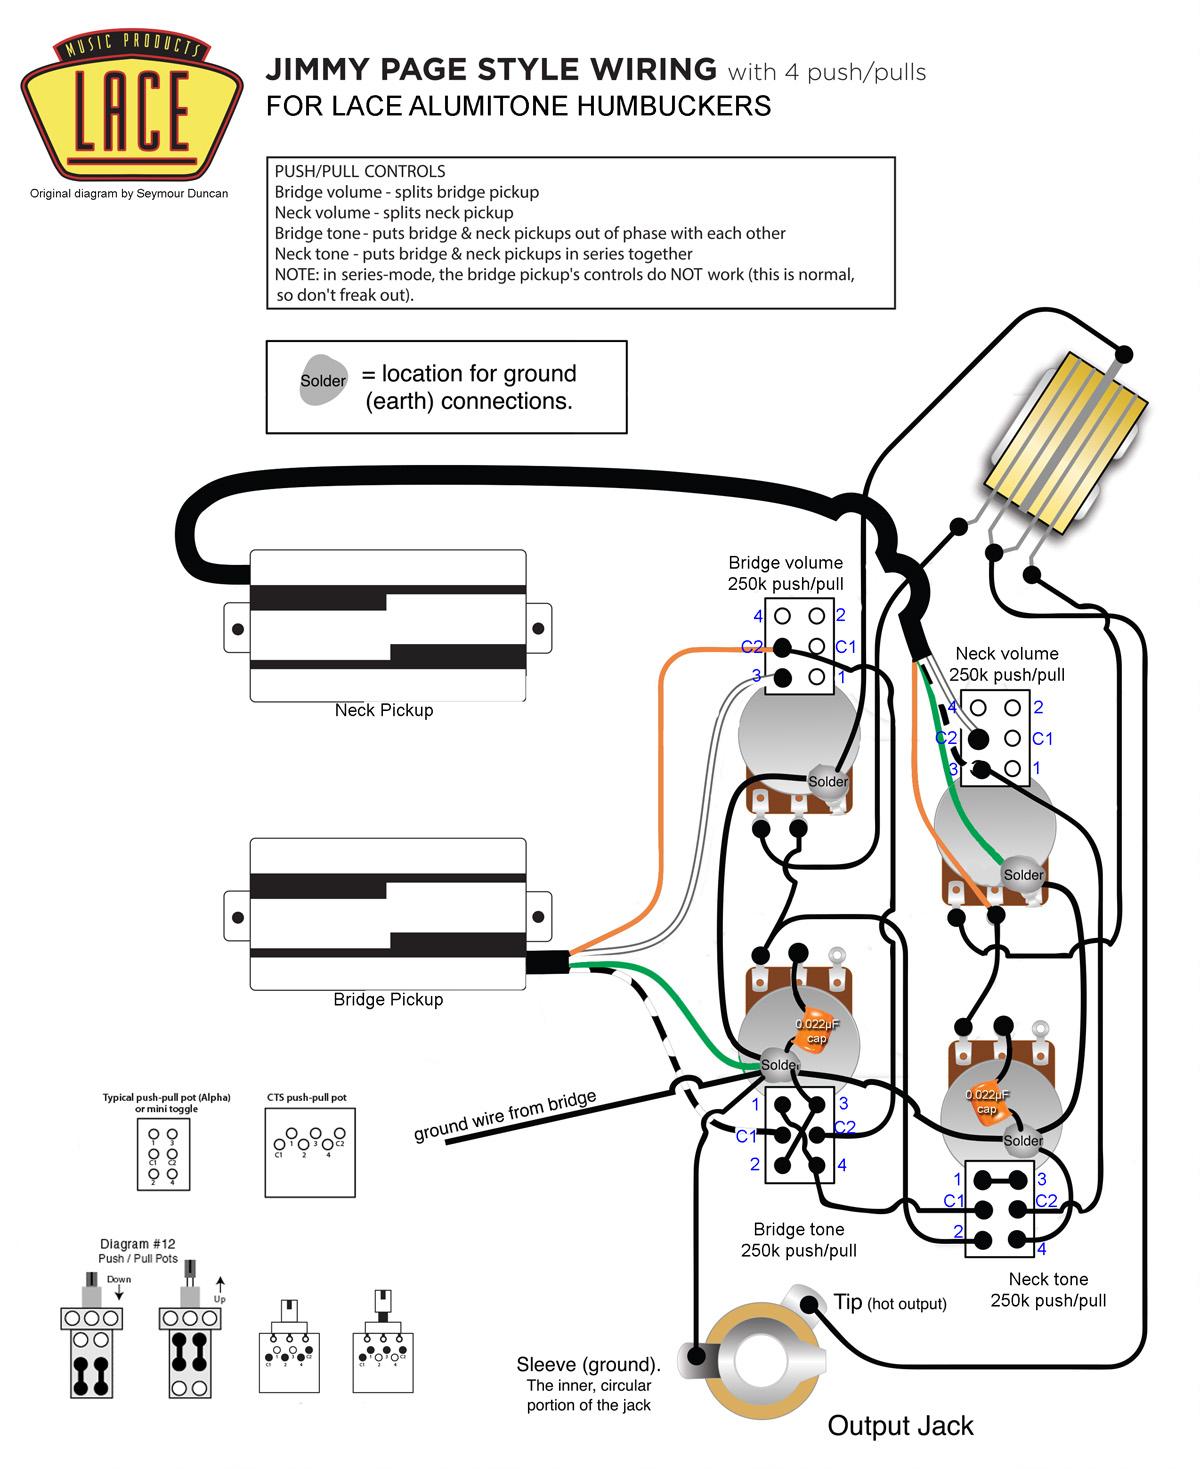 lace alumitone humbucker wiring diagram wiring diagram schematicslace alumitone wiring wiring diagram gp lace alumitone humbucker wiring diagram